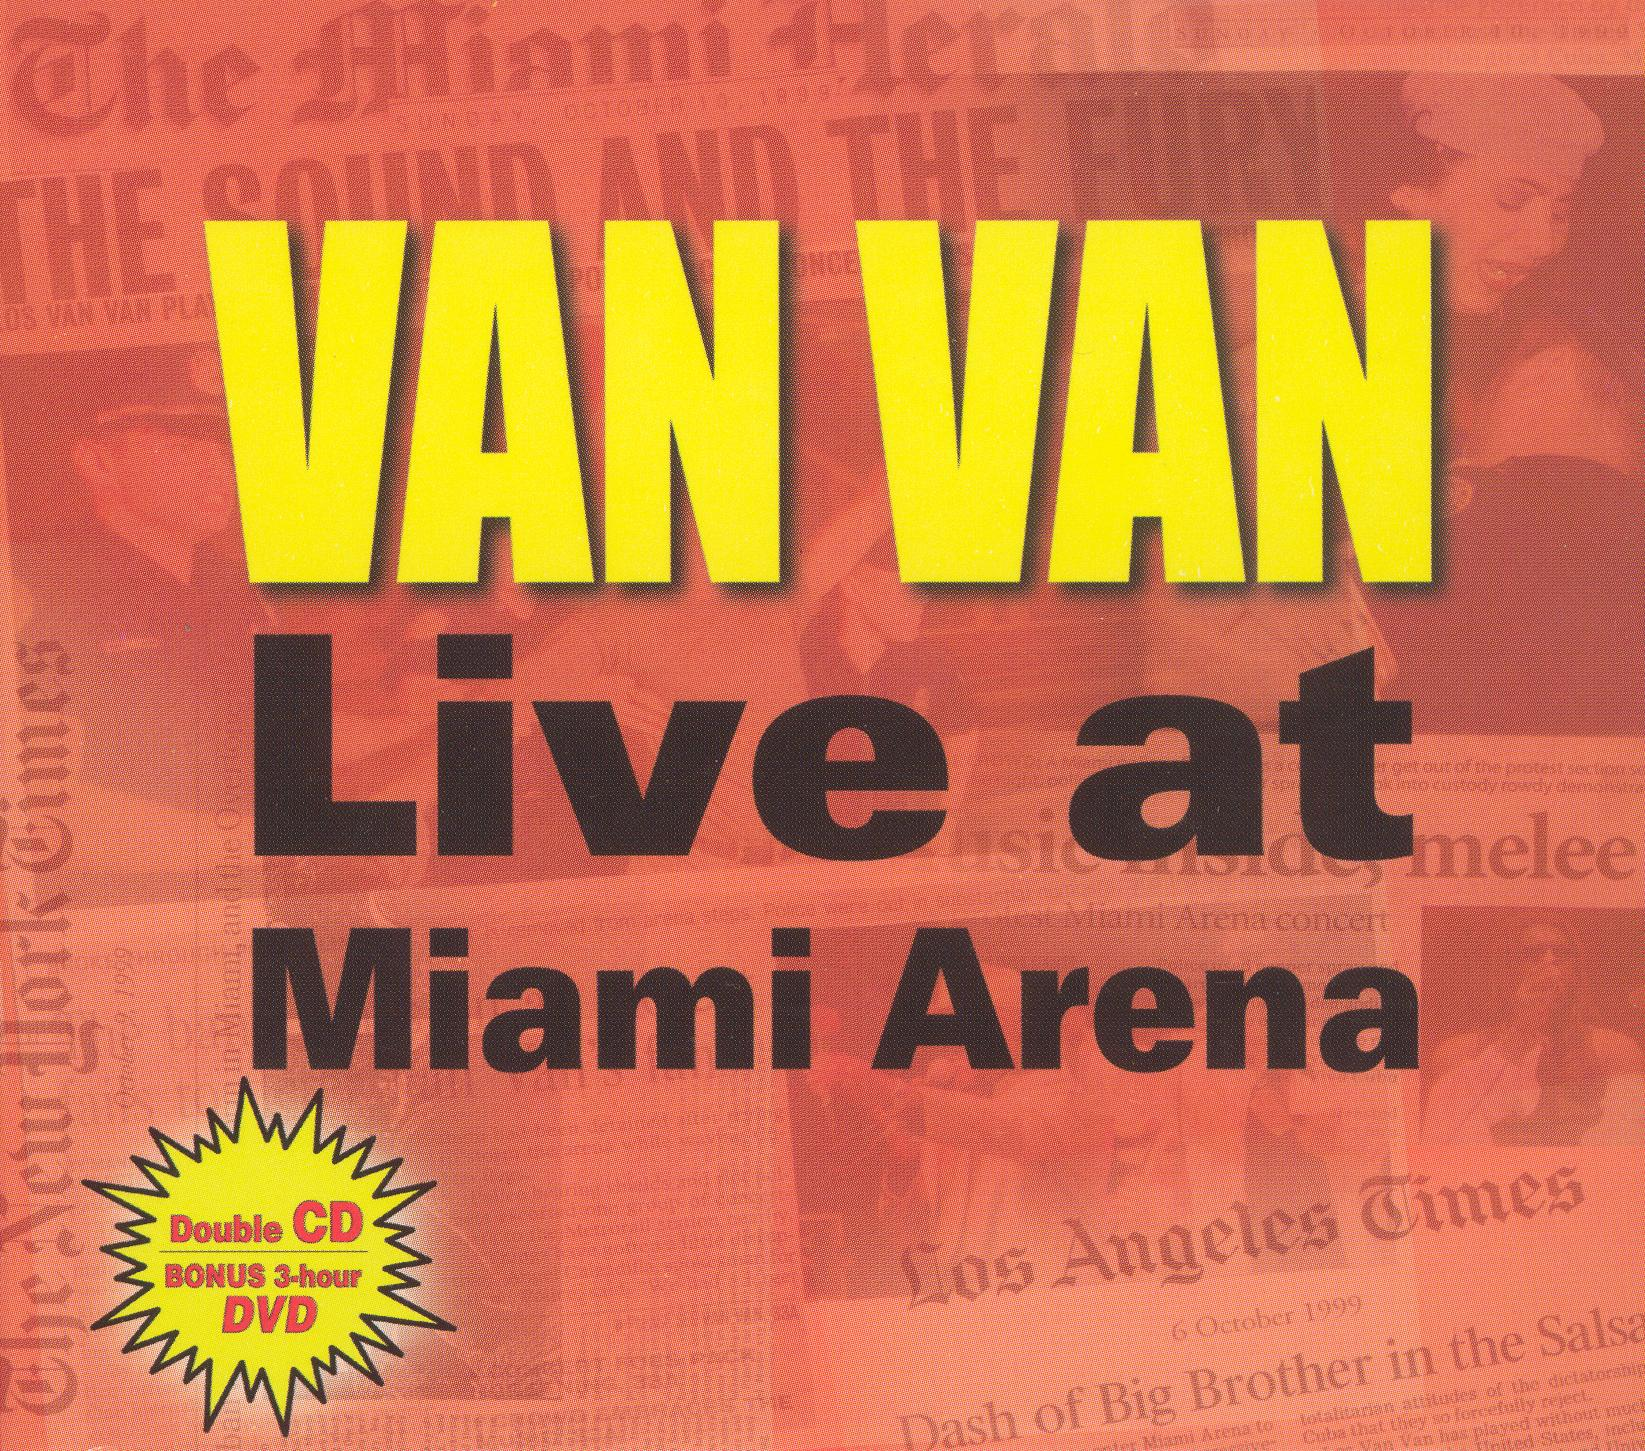 Los Van Van: Live at Miami Arena